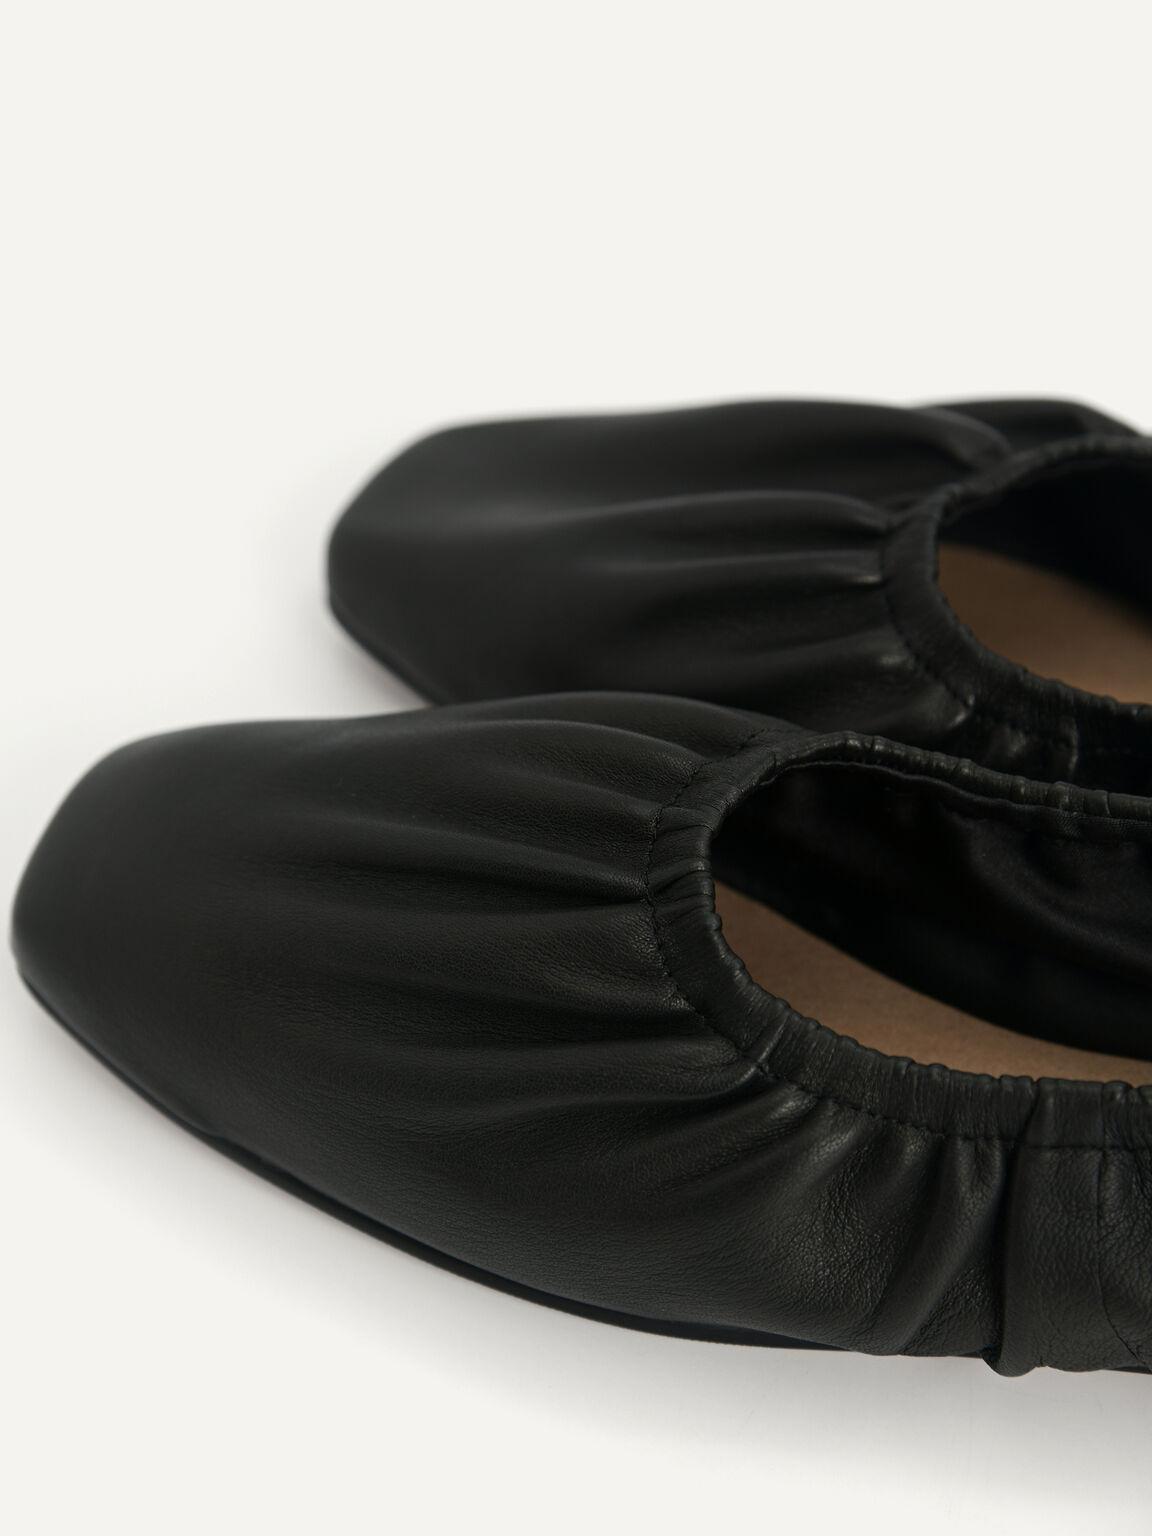 Ruched Leather Flats, Black, hi-res